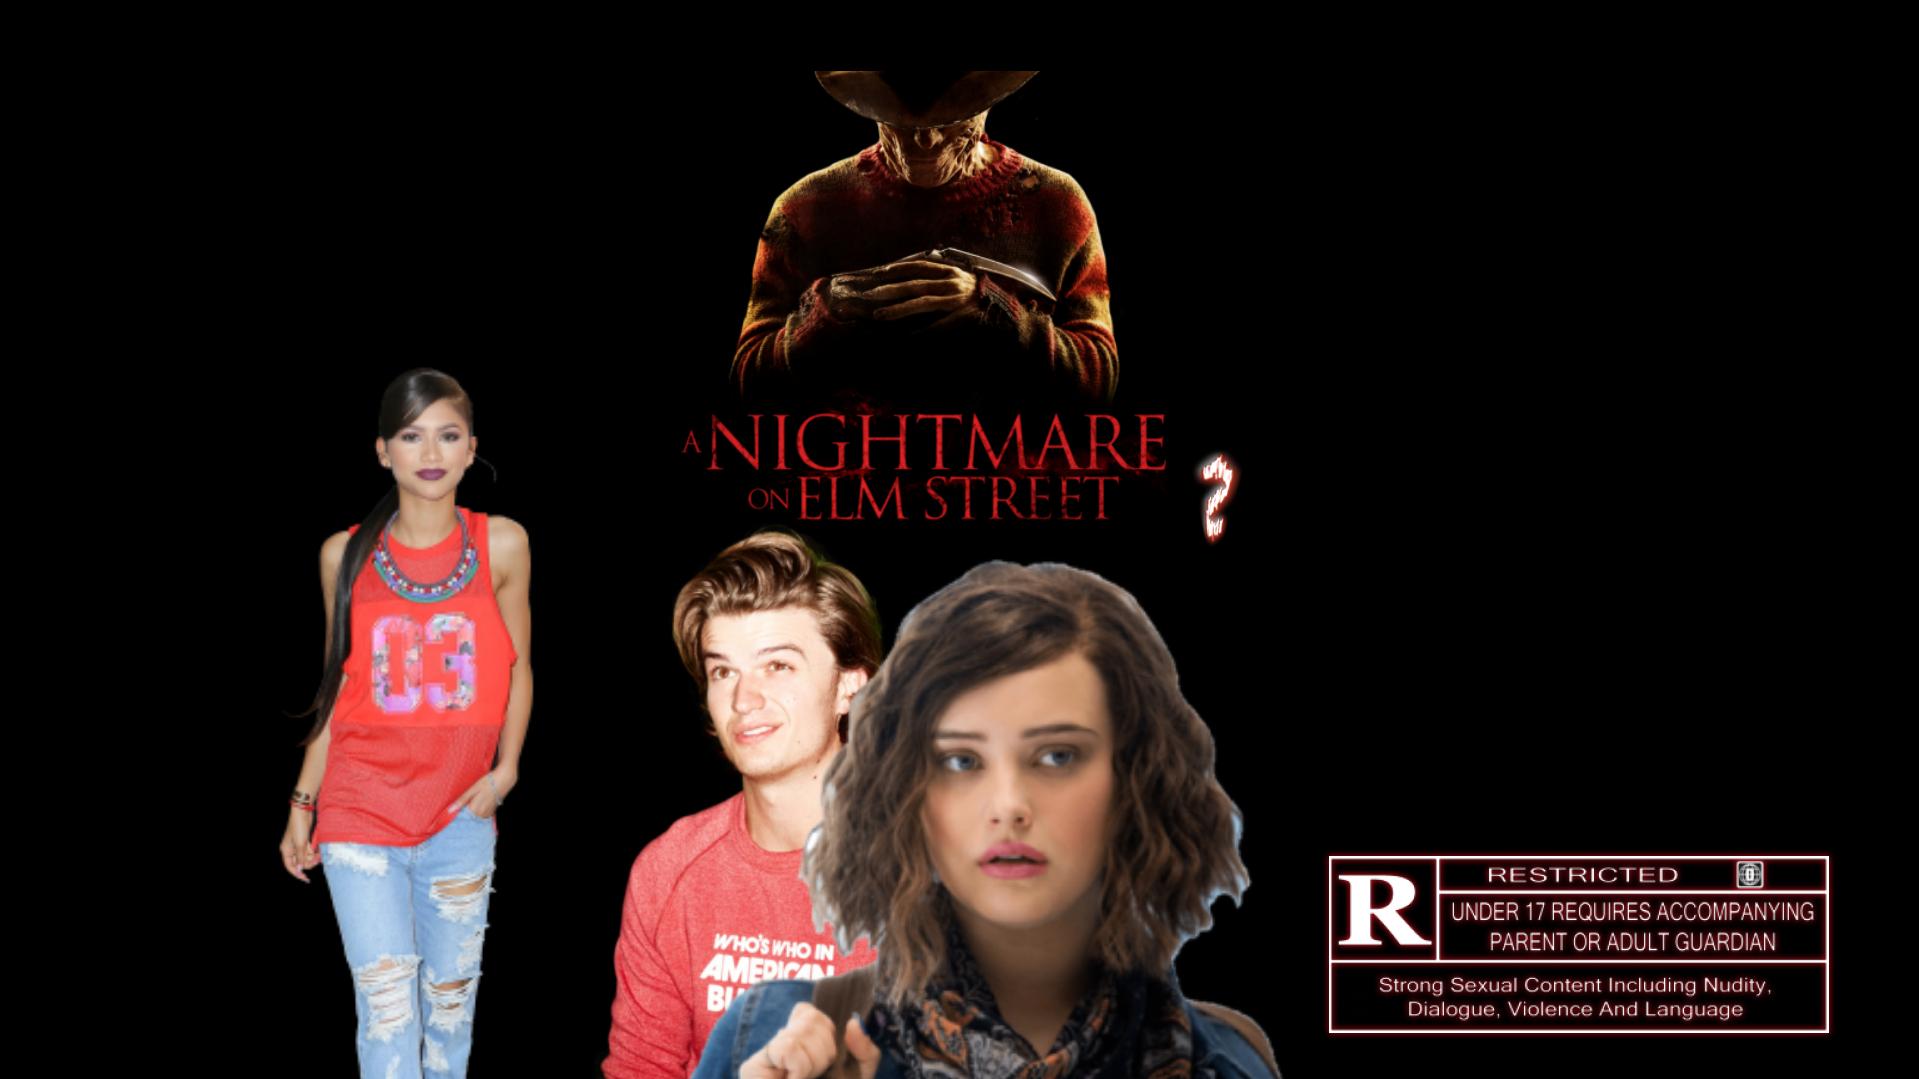 A Nightmare On Elm Street 2: Freddy's Back!